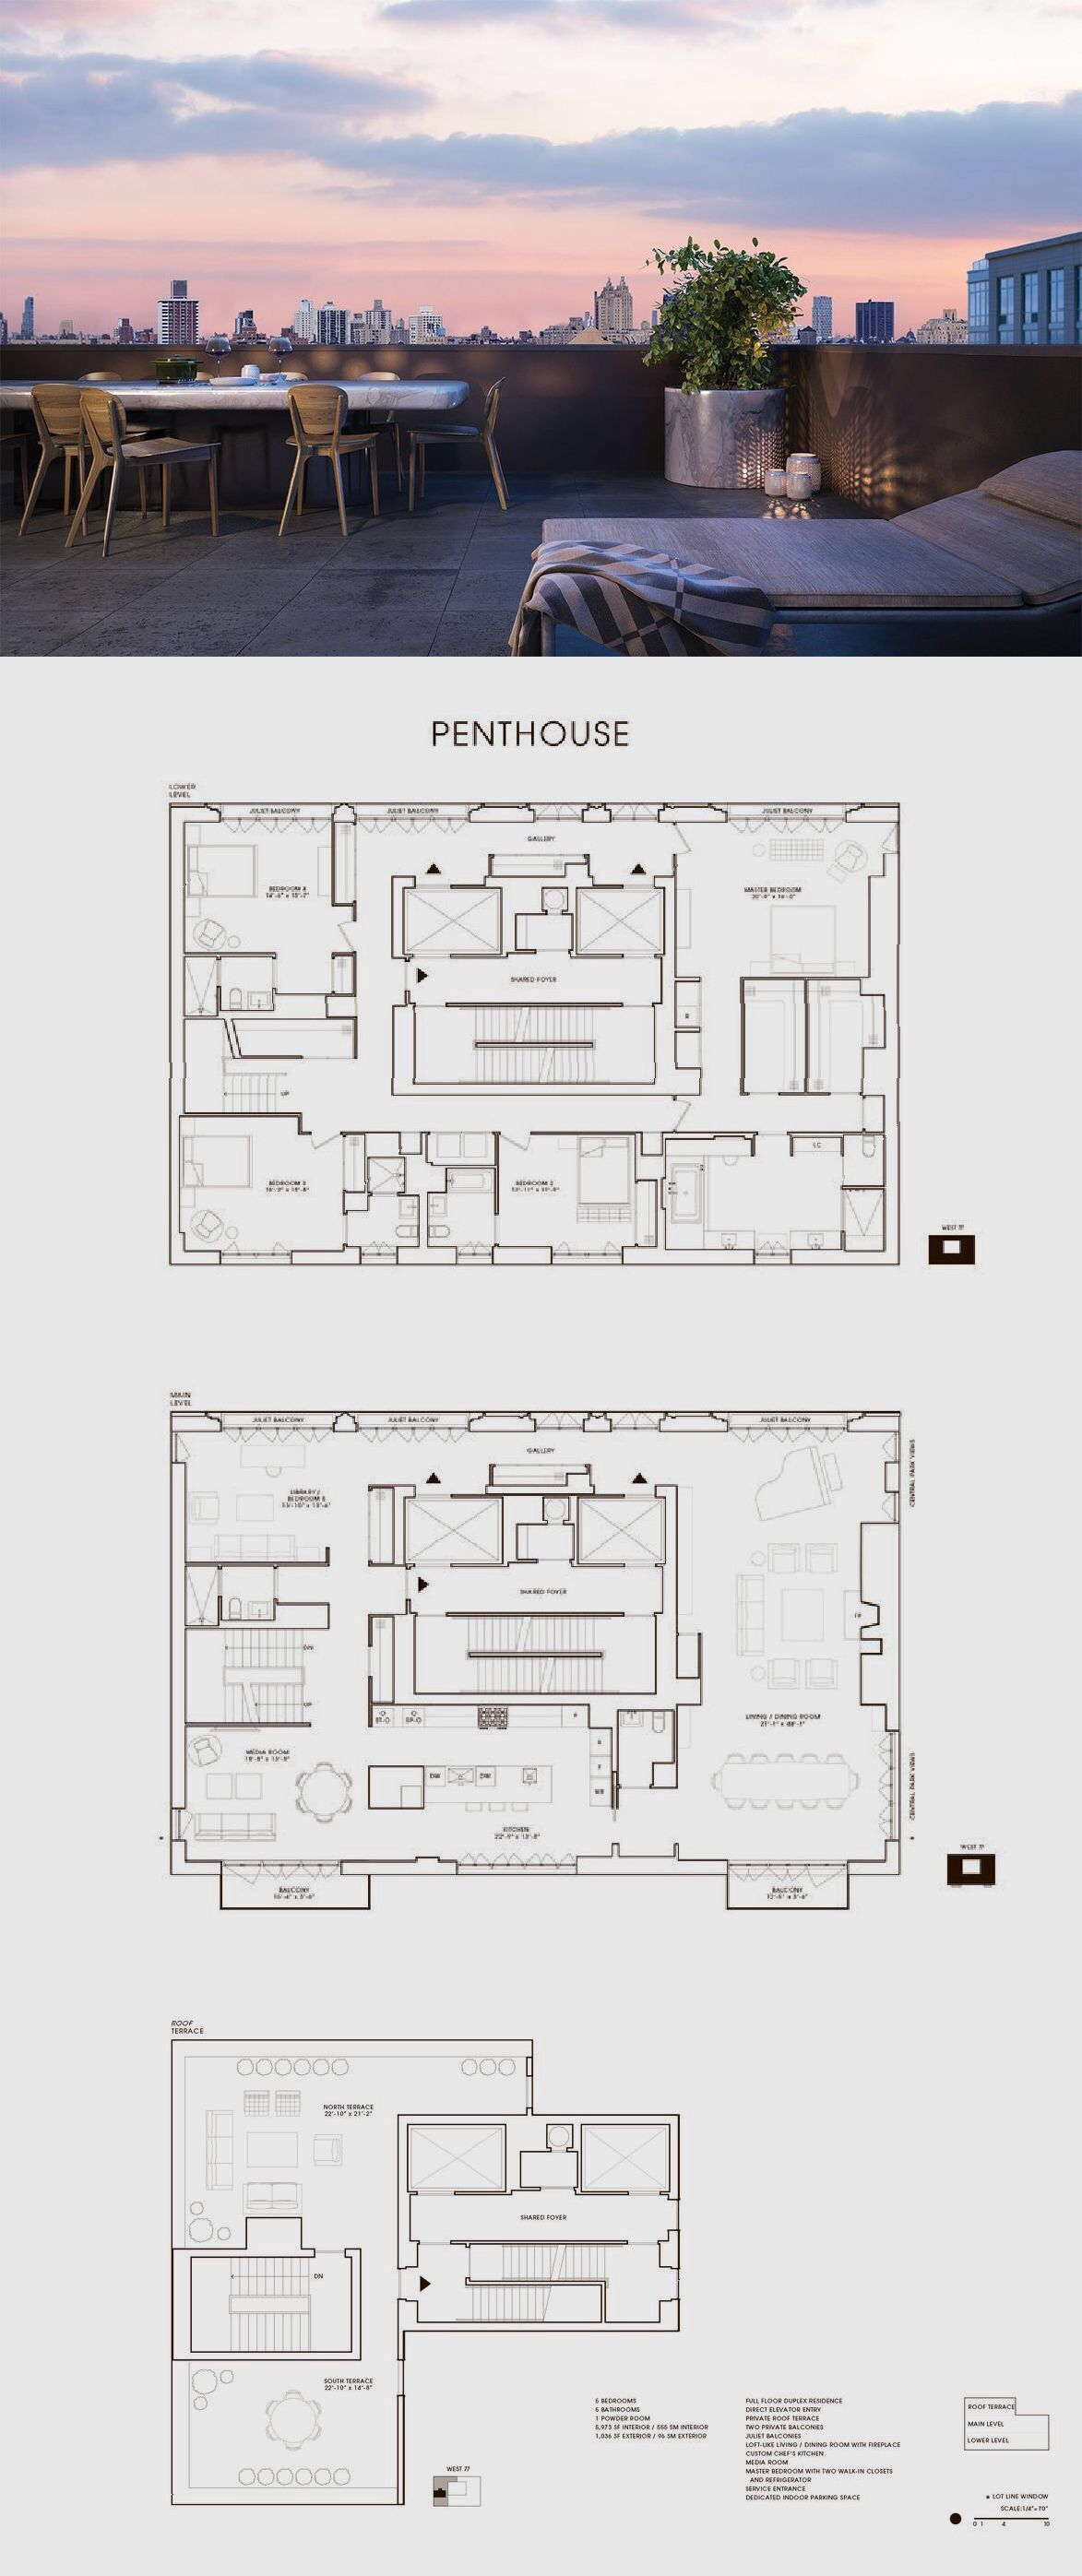 Two Ten West 77 Penthouse Penthouse Apartment Floor Plan Floor Plan Design House Floor Plans